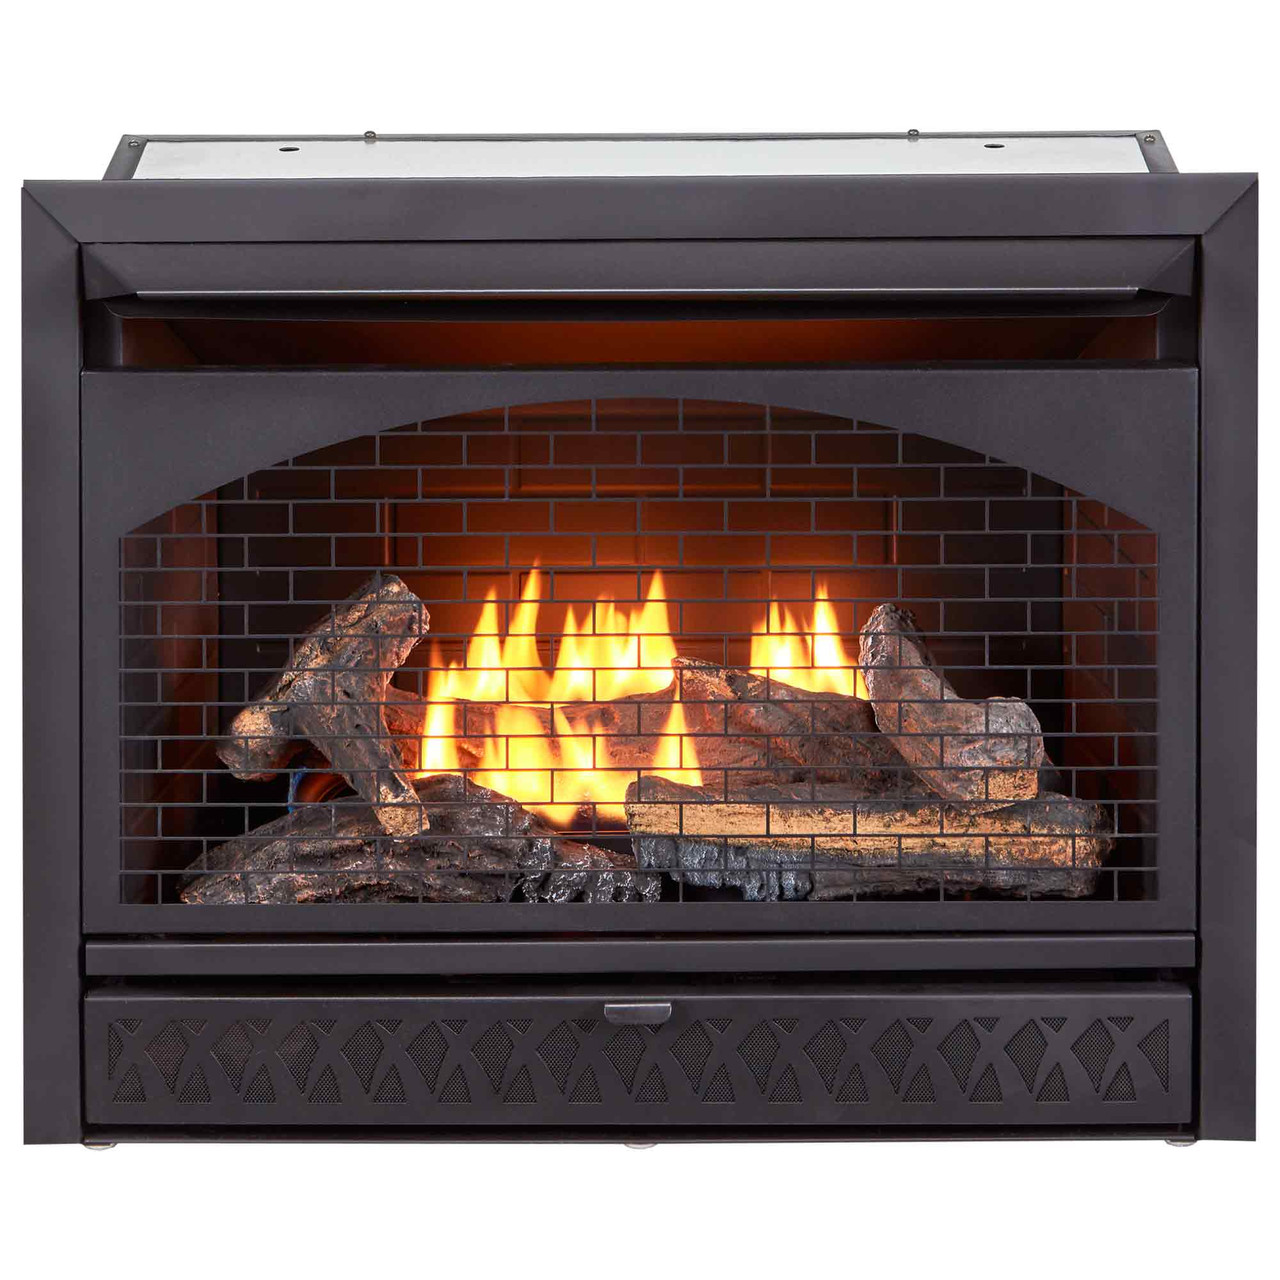 Procom Fireplaces 29 In Ventless Dual Fuel Firebox Insert Fbnsd28t